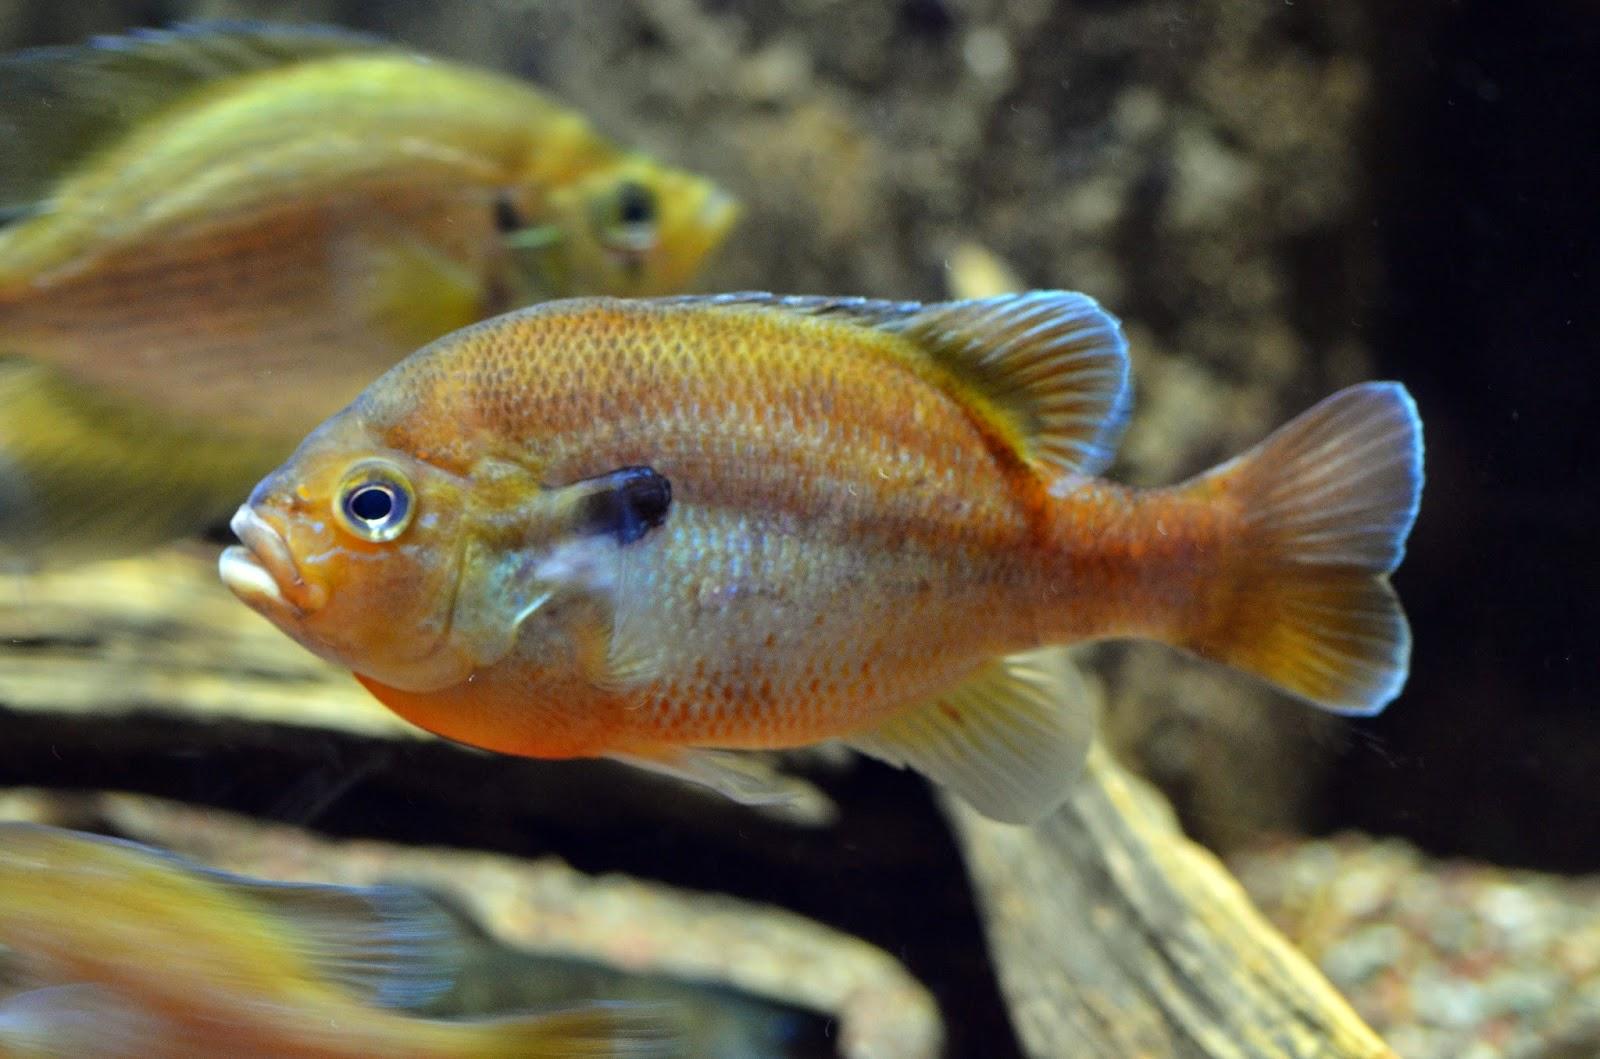 Virginia Fishes: Redbreast sunfish fry development